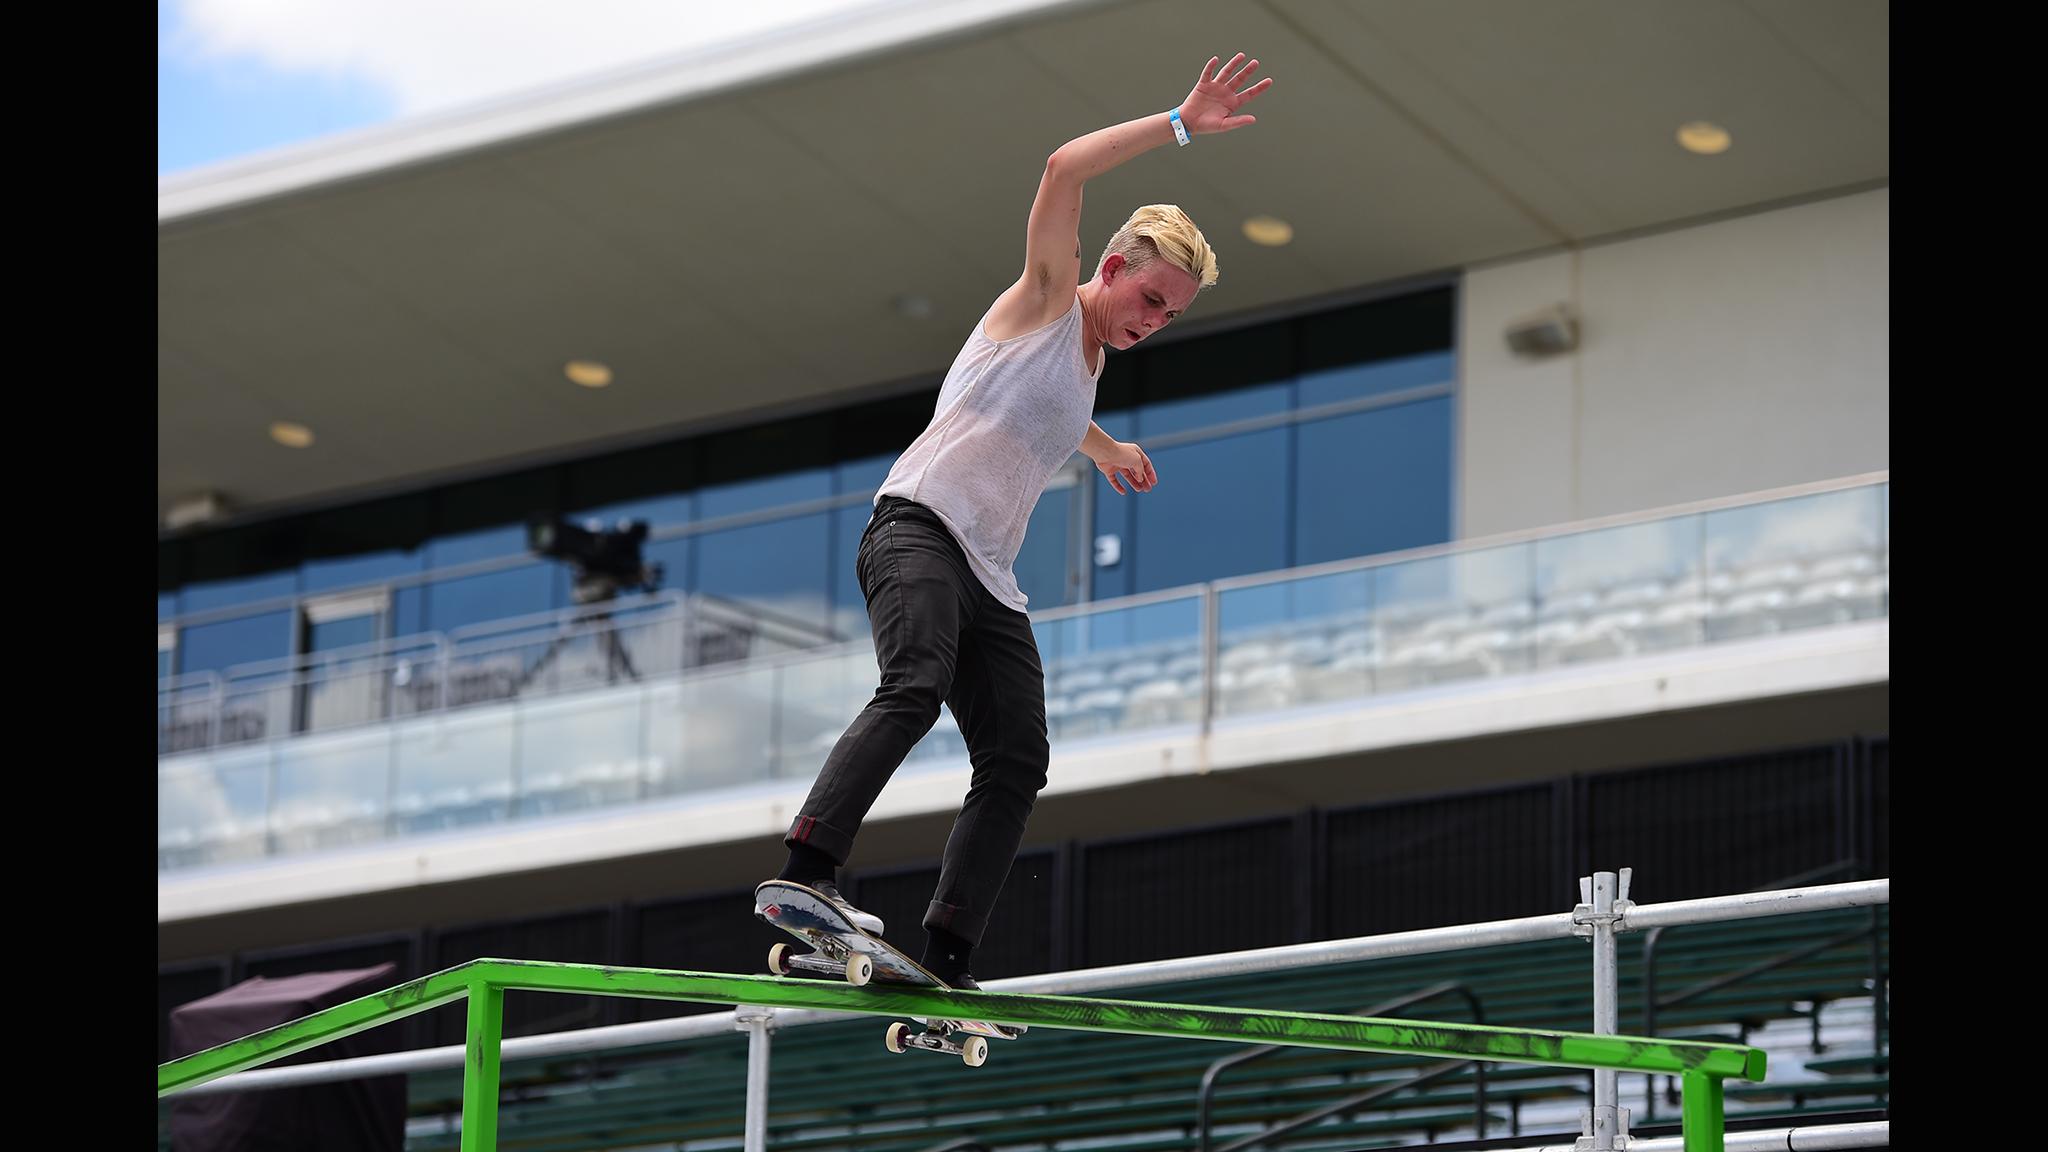 Women's Skate Street -- Lacey Baker